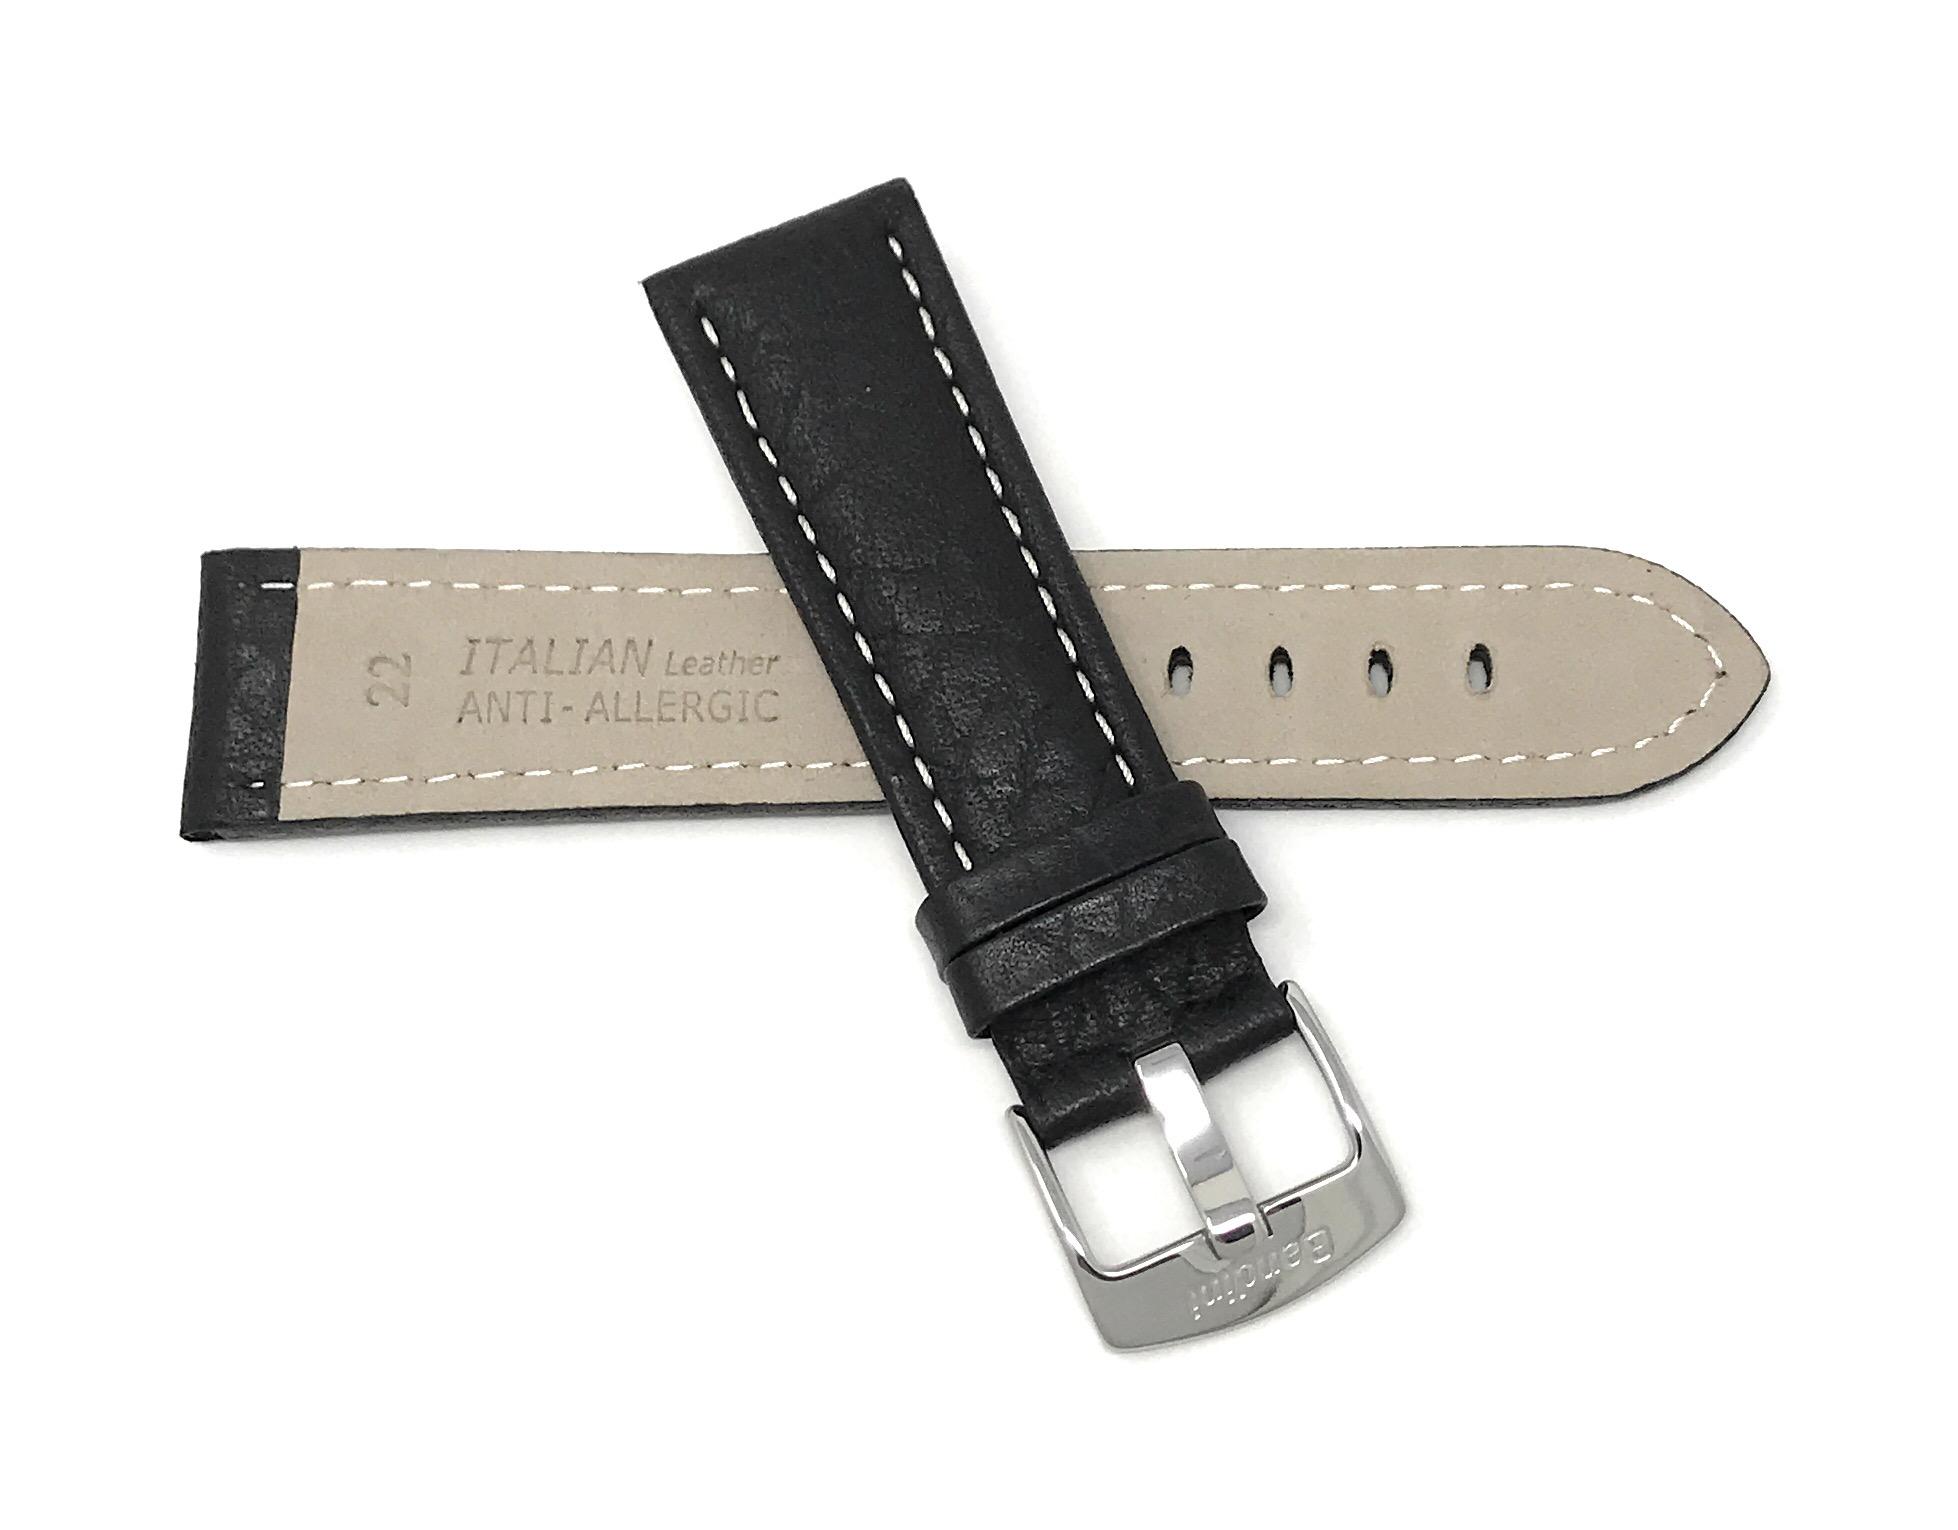 Bandini-Watch-Band-Leather-Strap-Buffalo-Pattern-18mm-30mm-Extra-Long-Also thumbnail 12